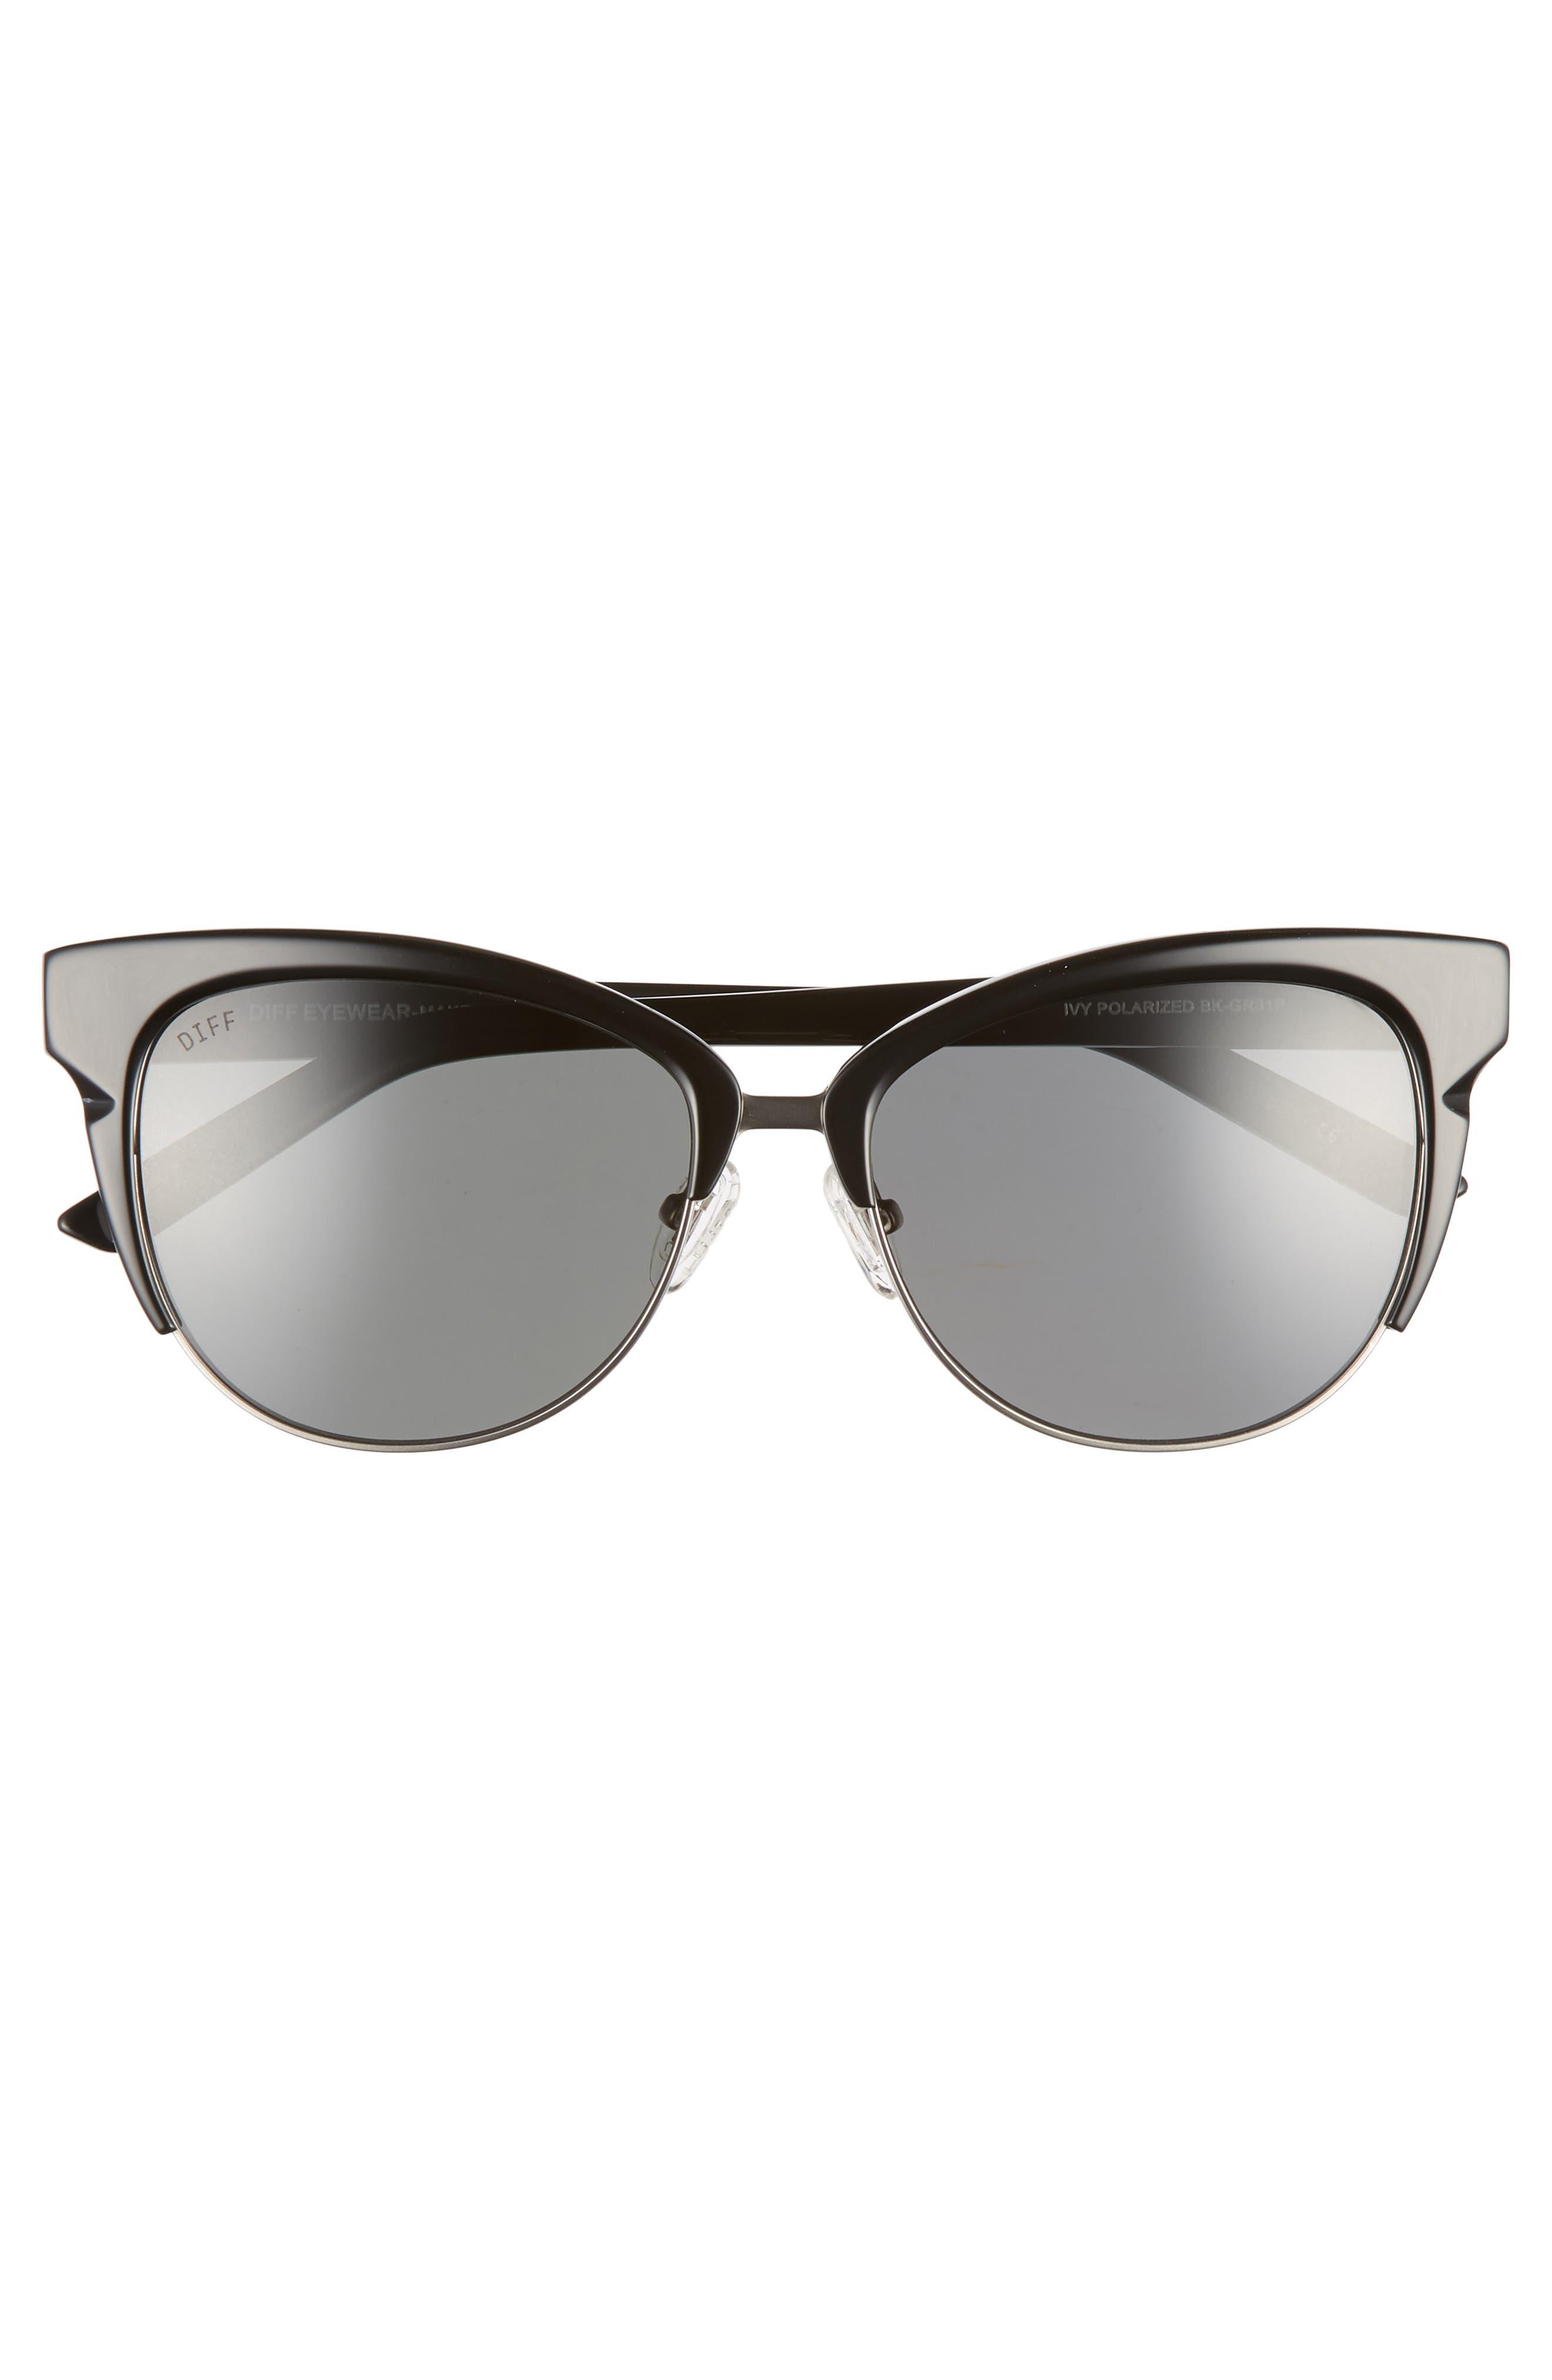 Ivy 56mm Polarized Cat Eye Sunglasses,                             Alternate thumbnail 2, color,                             BLACK/ DARK SMOKE